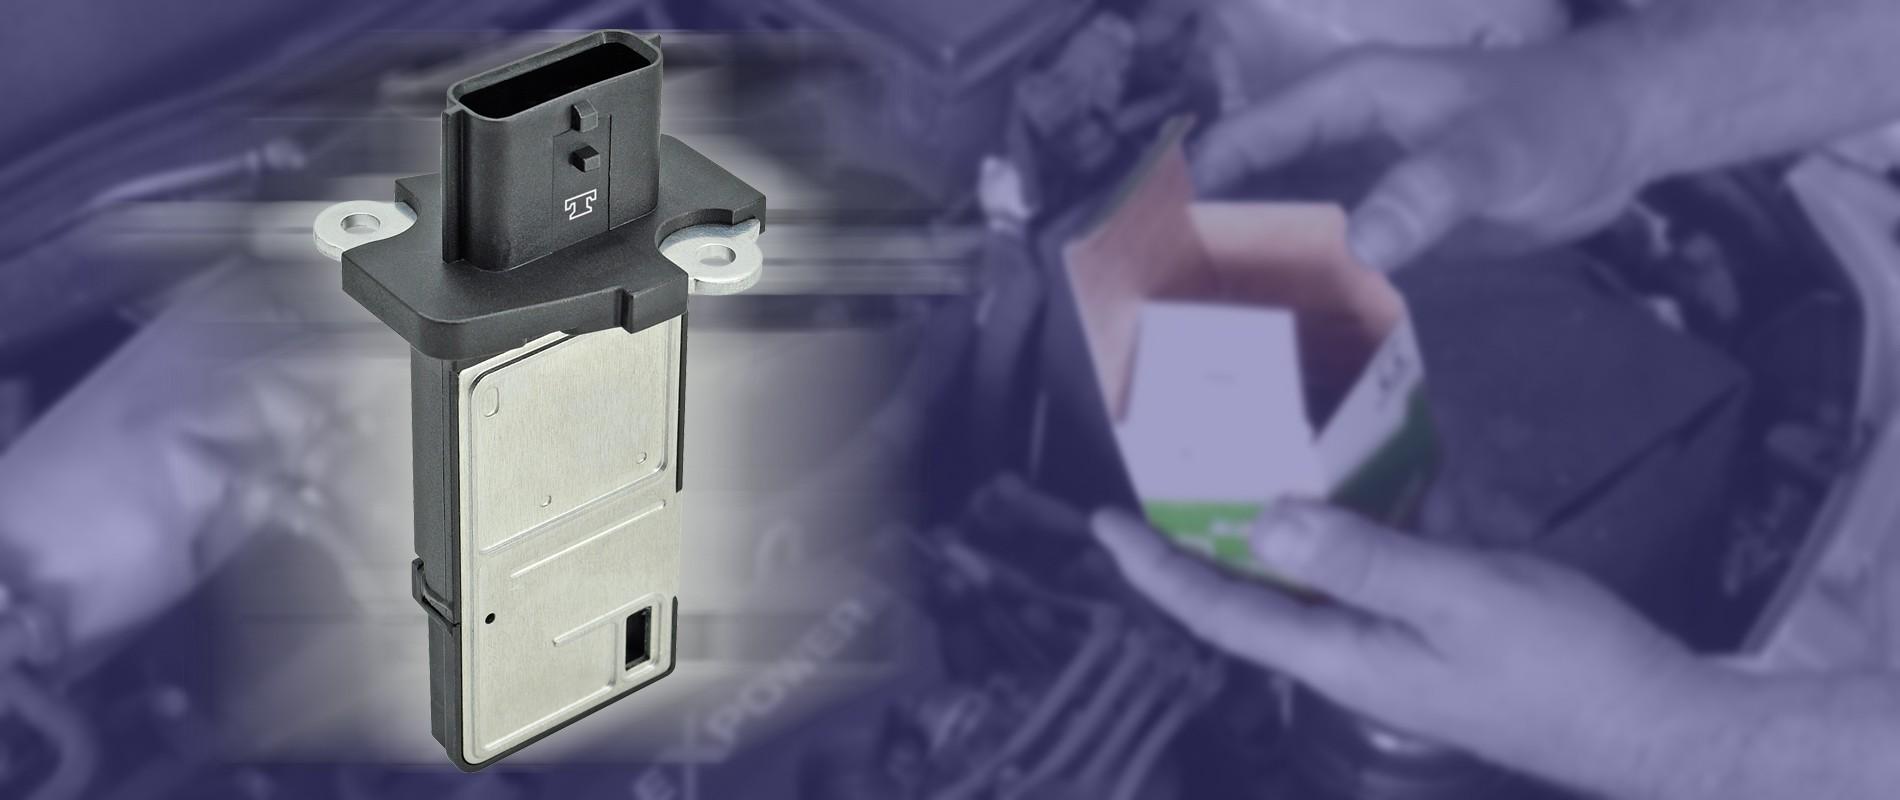 Sensor MAF Medidor de Fluxo de Ar 71071